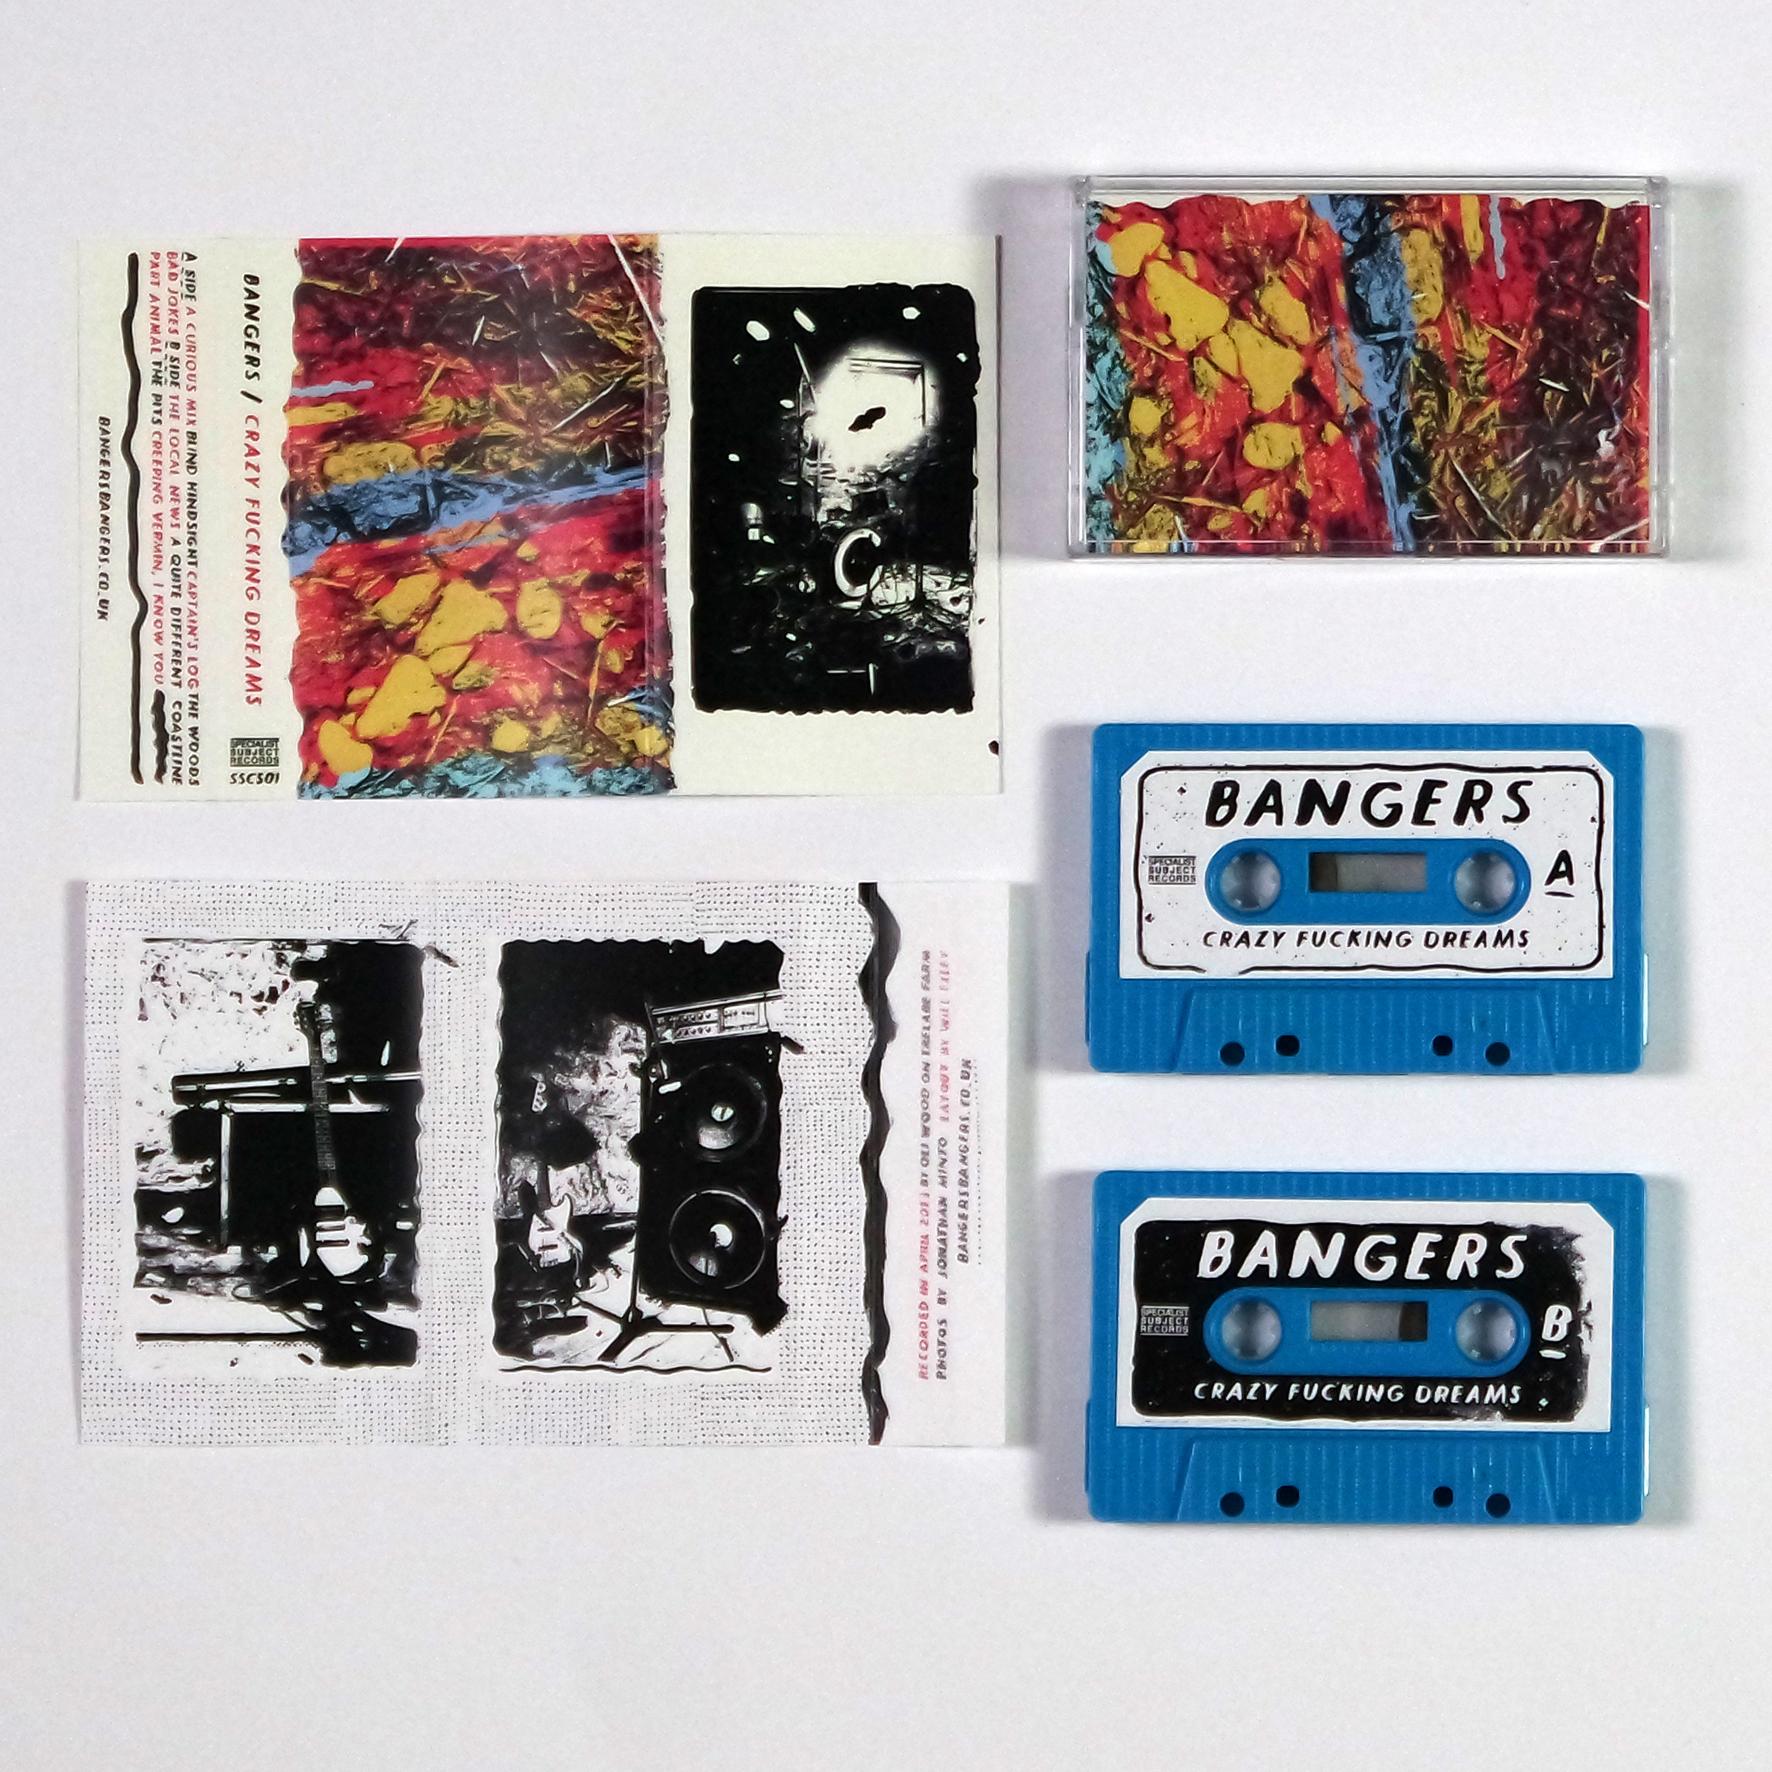 Bangers - Crazy Fucking Dreams CD